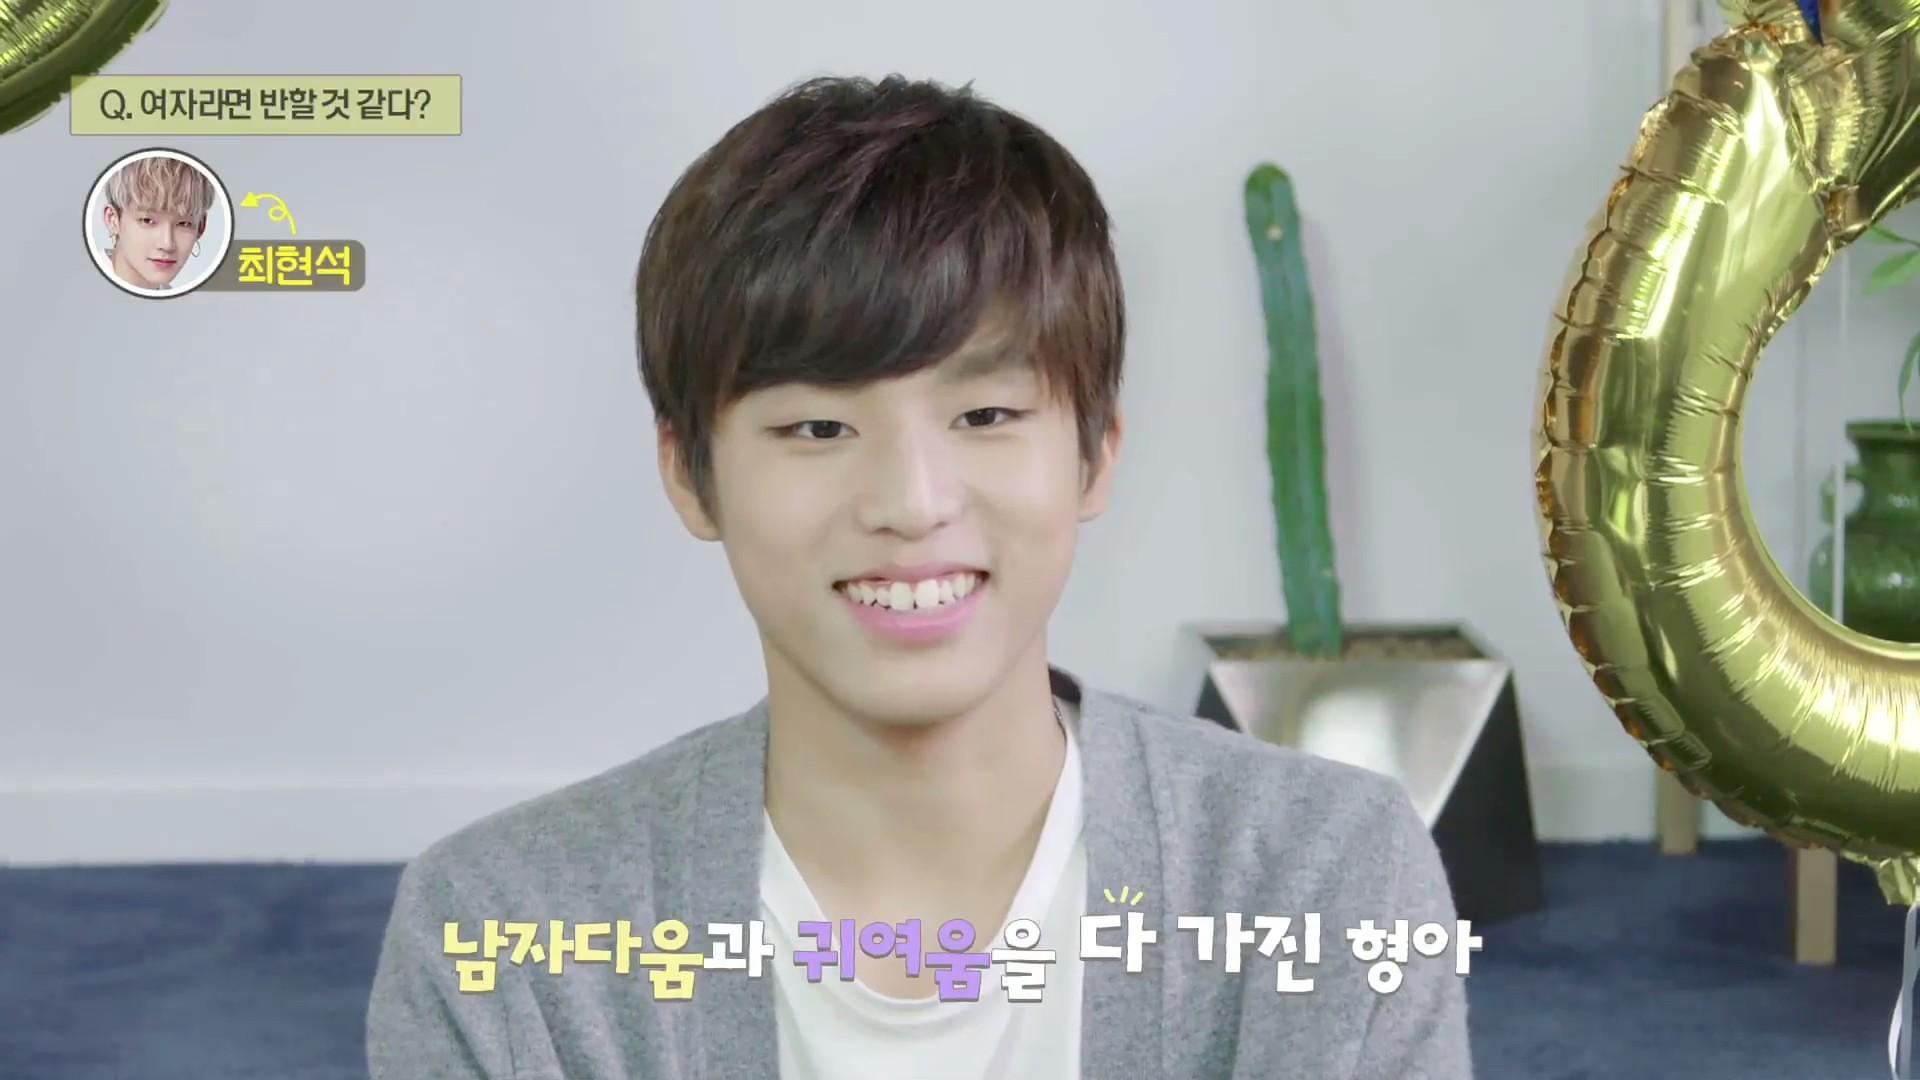 [SURVEY CAM] C#1 박정우 <PARK JEONGWOO> l YG보석함